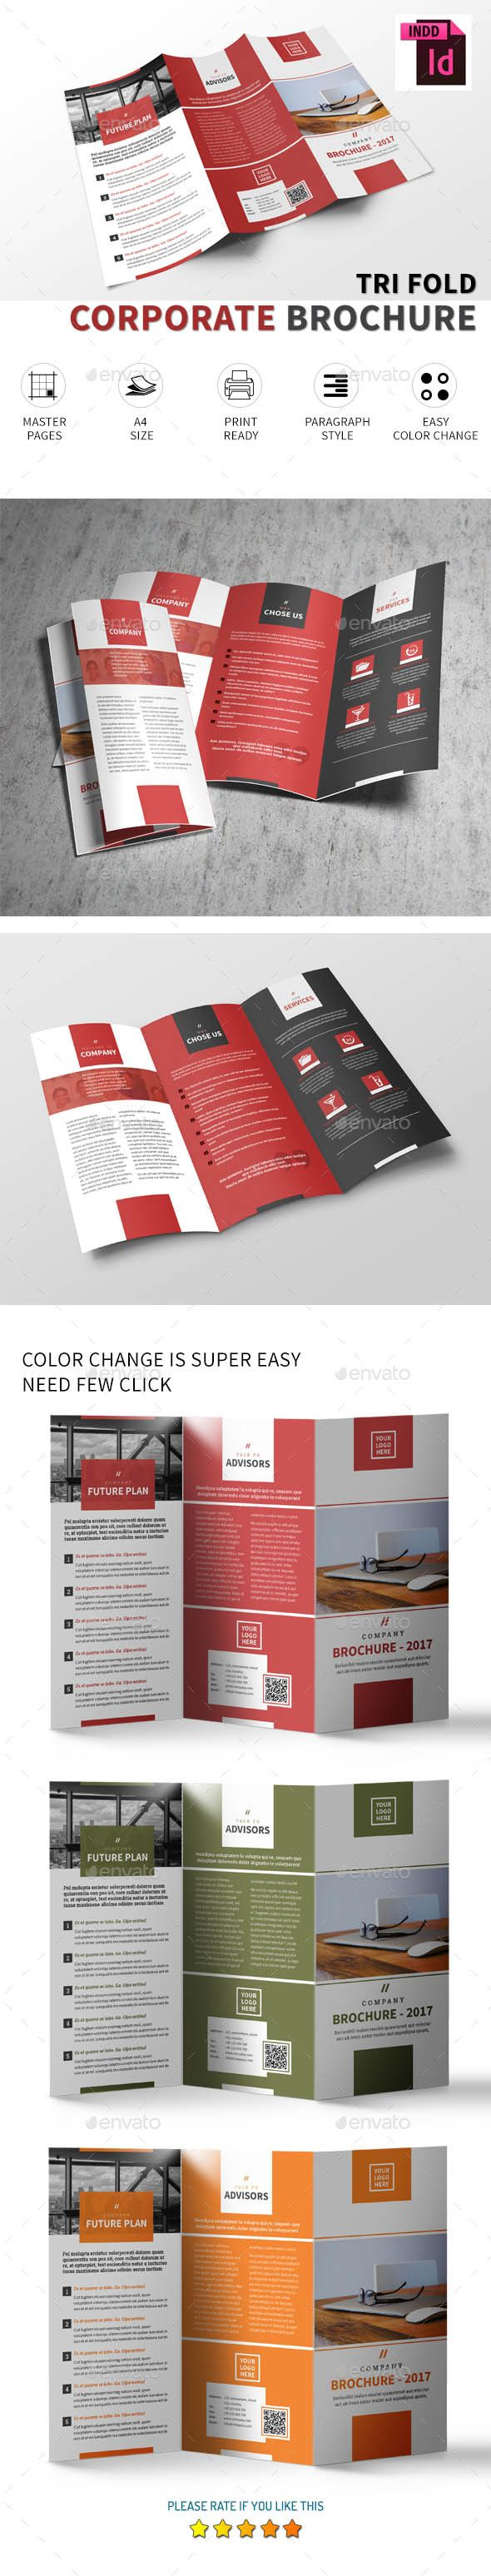 1000 ideas about tri fold brochure on pinterest tri fold bi fold brochure and brochures. Black Bedroom Furniture Sets. Home Design Ideas